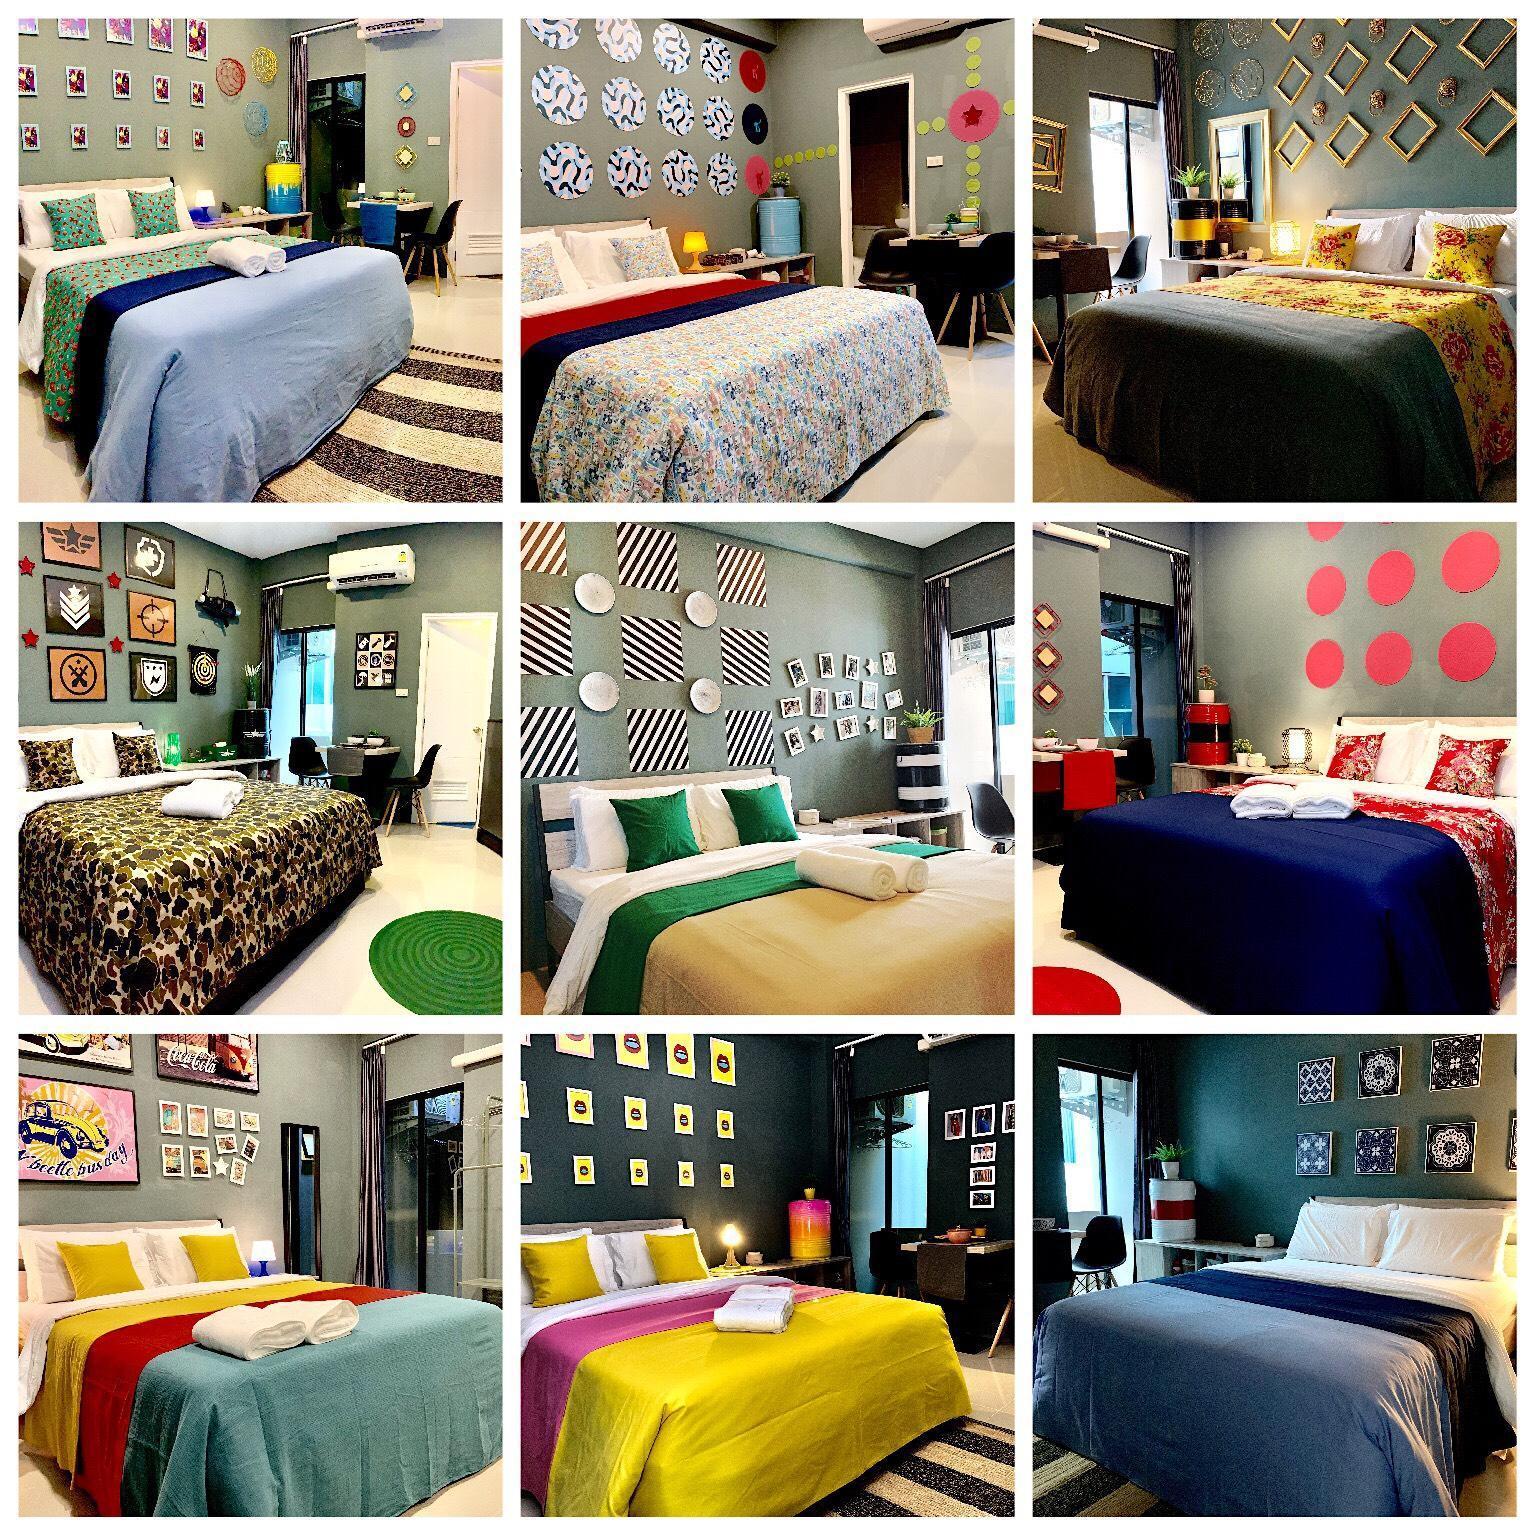 Cozy Room with private bathroom balcony22